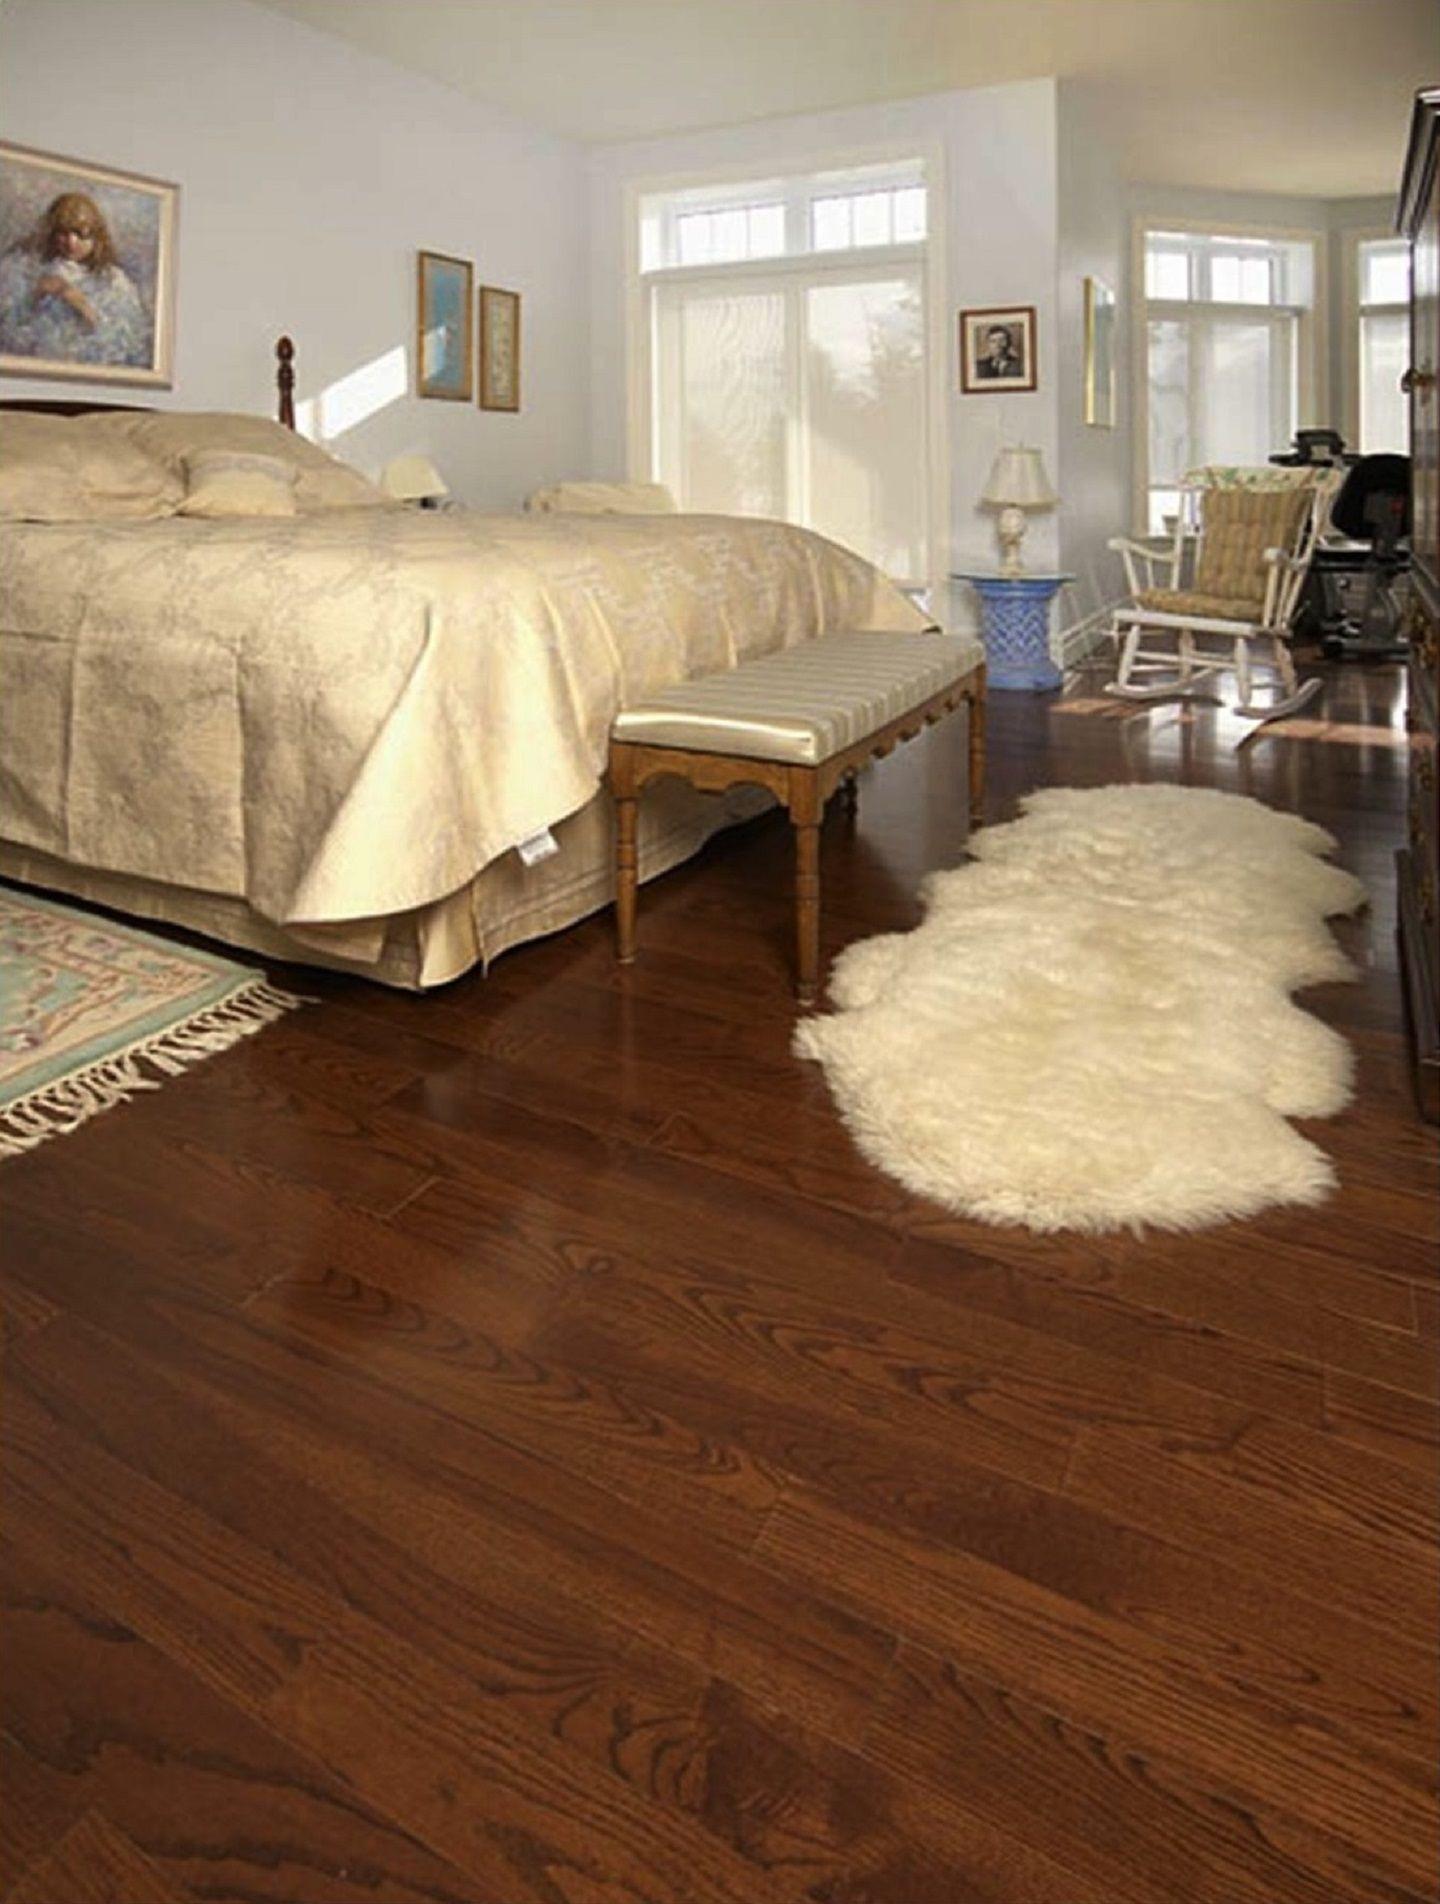 hardwood floor restoration toronto of ash brandon gaylord hardwood flooring hardwood floors pinterest throughout ash brandon gaylord hardwood flooring